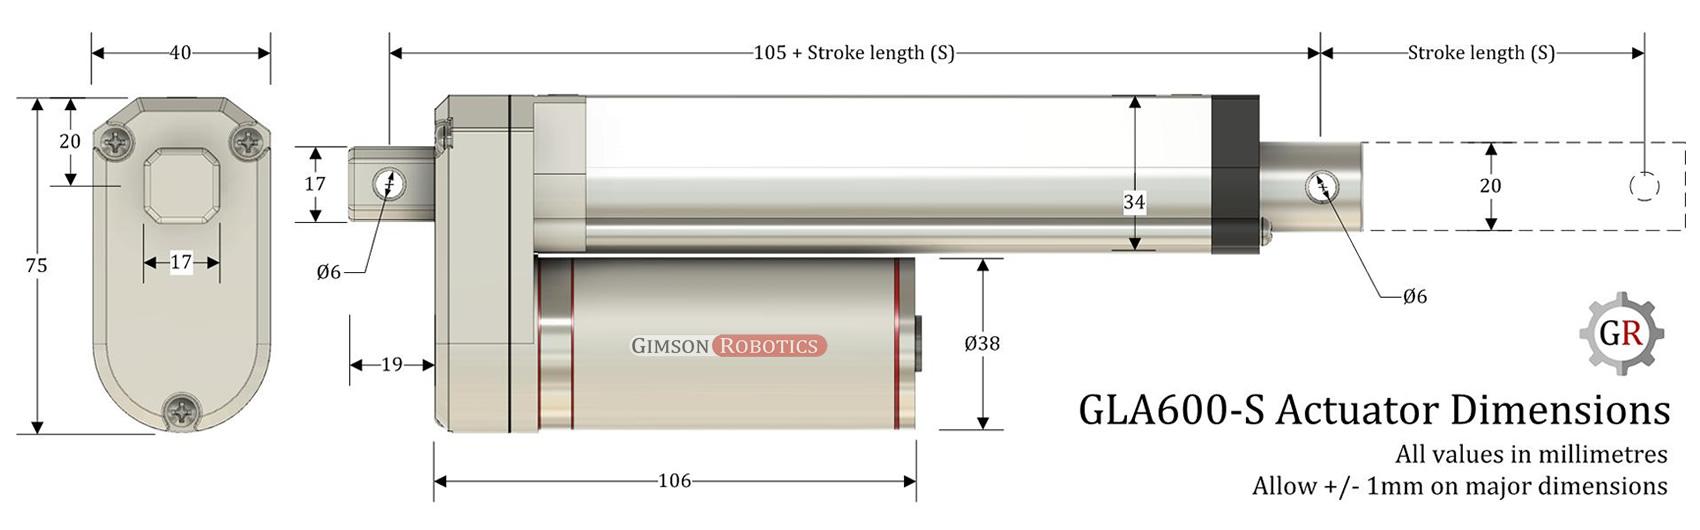 GLA600-S Actuator Dimensions